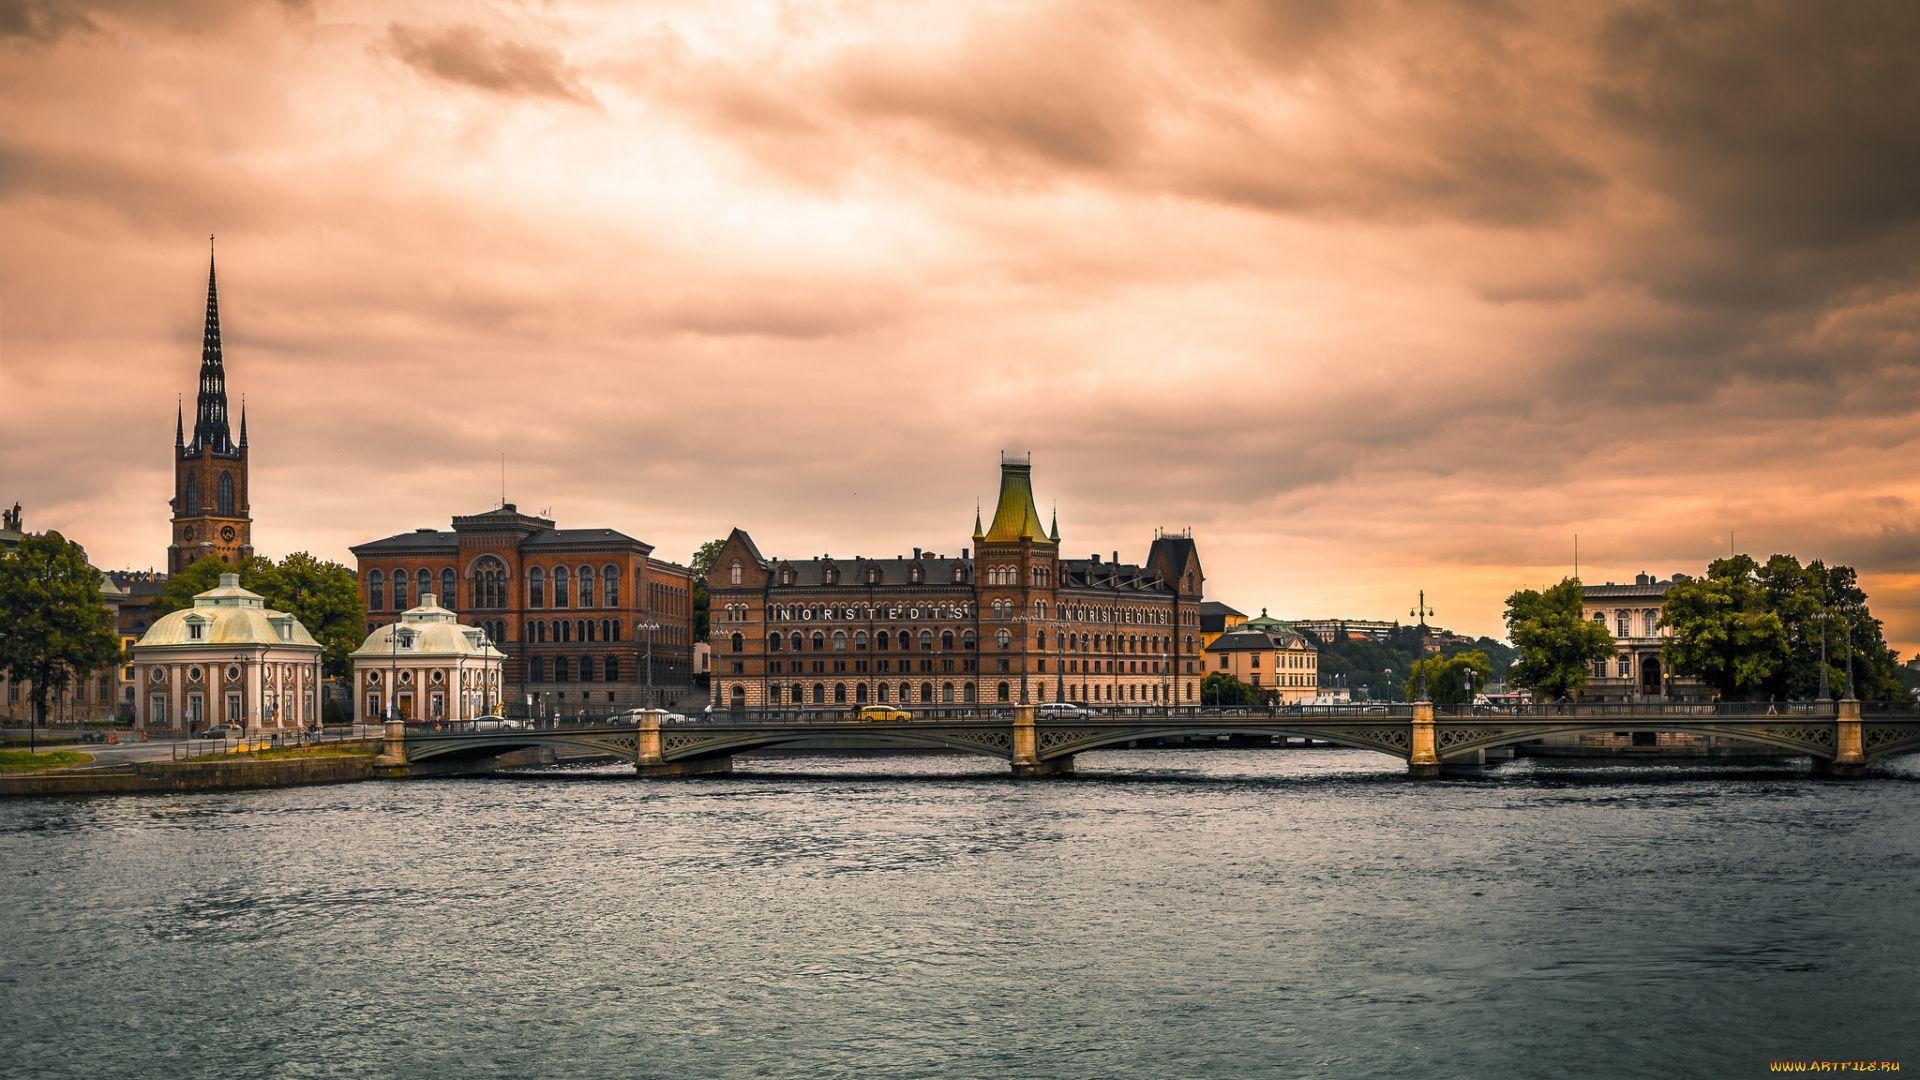 Sweden wallpaper photo hd